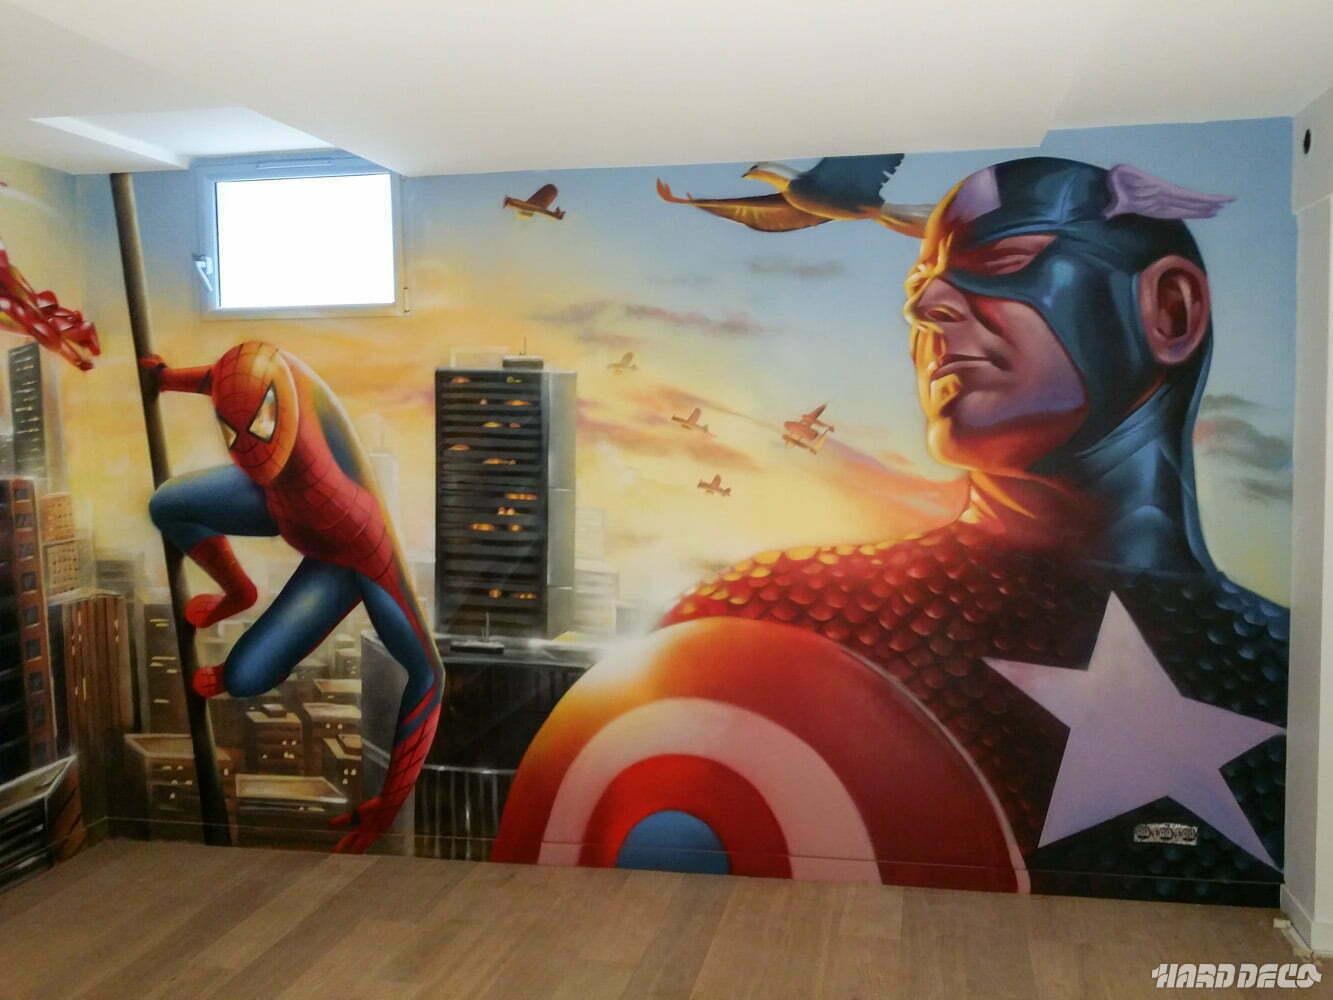 deco-avengers-spiderman-captain-america  Hard Deco